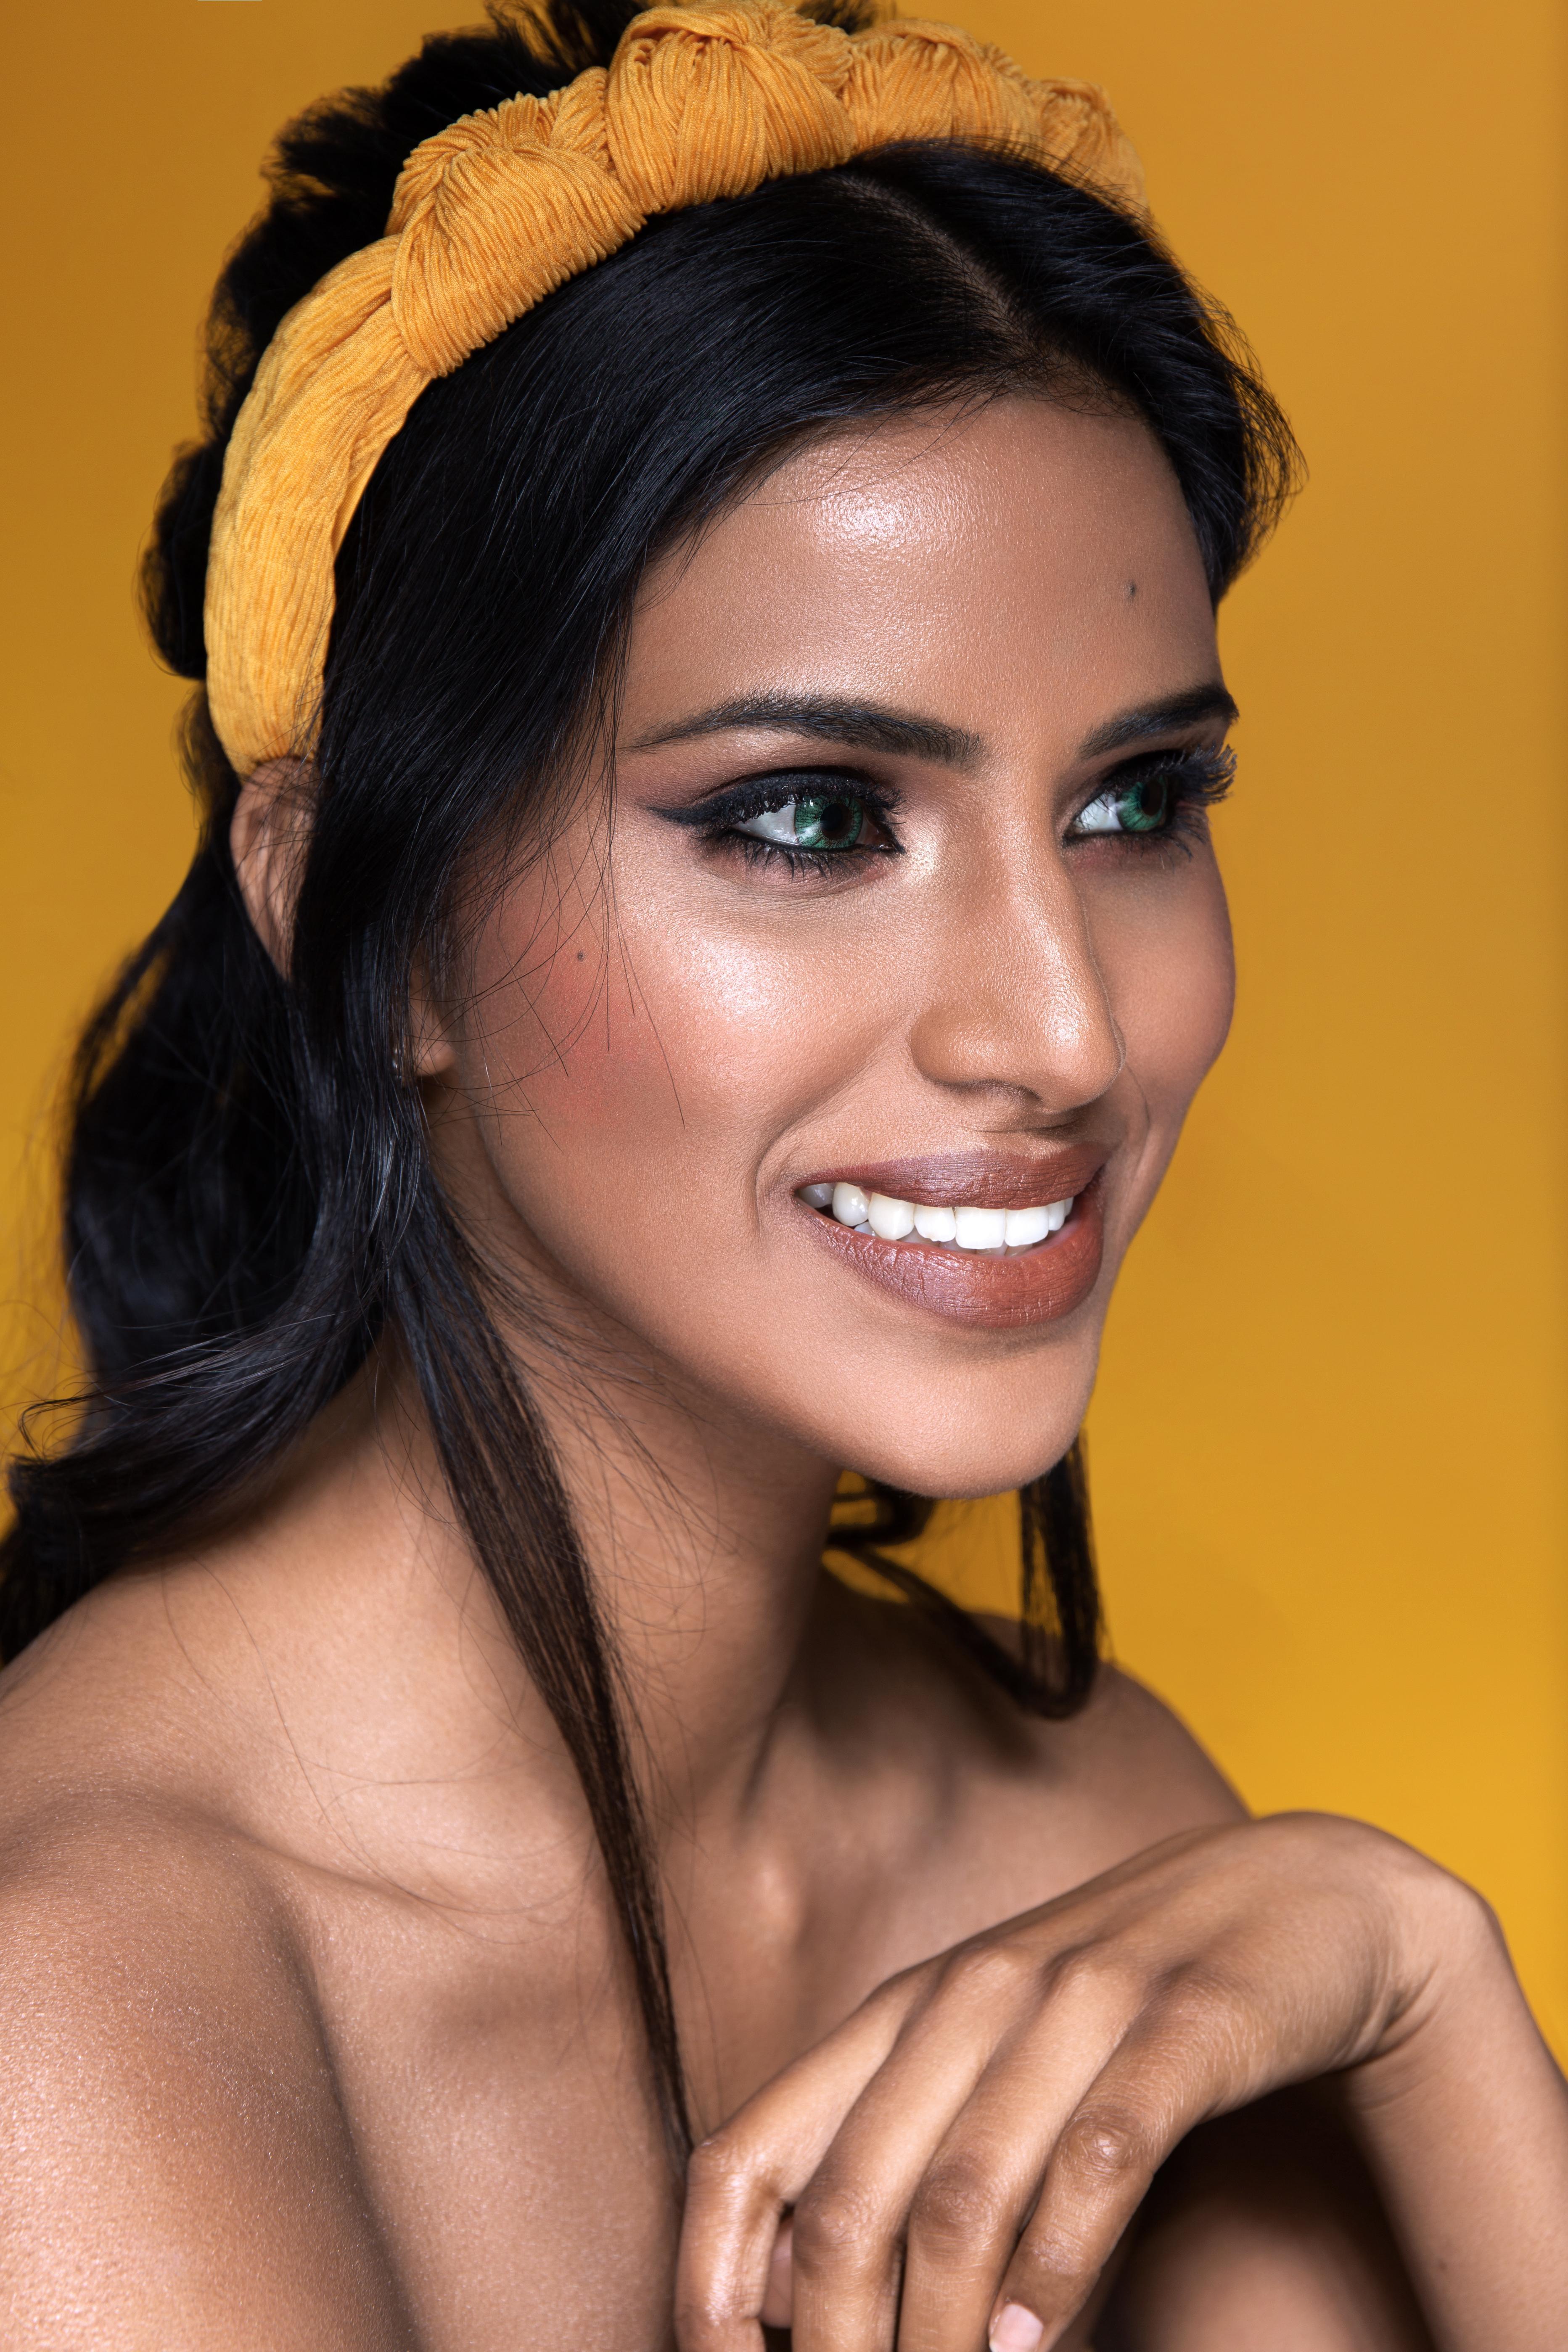 gorgeous-natural-bridal-makeup-with-glowing-skin-and-smokey-eye-London